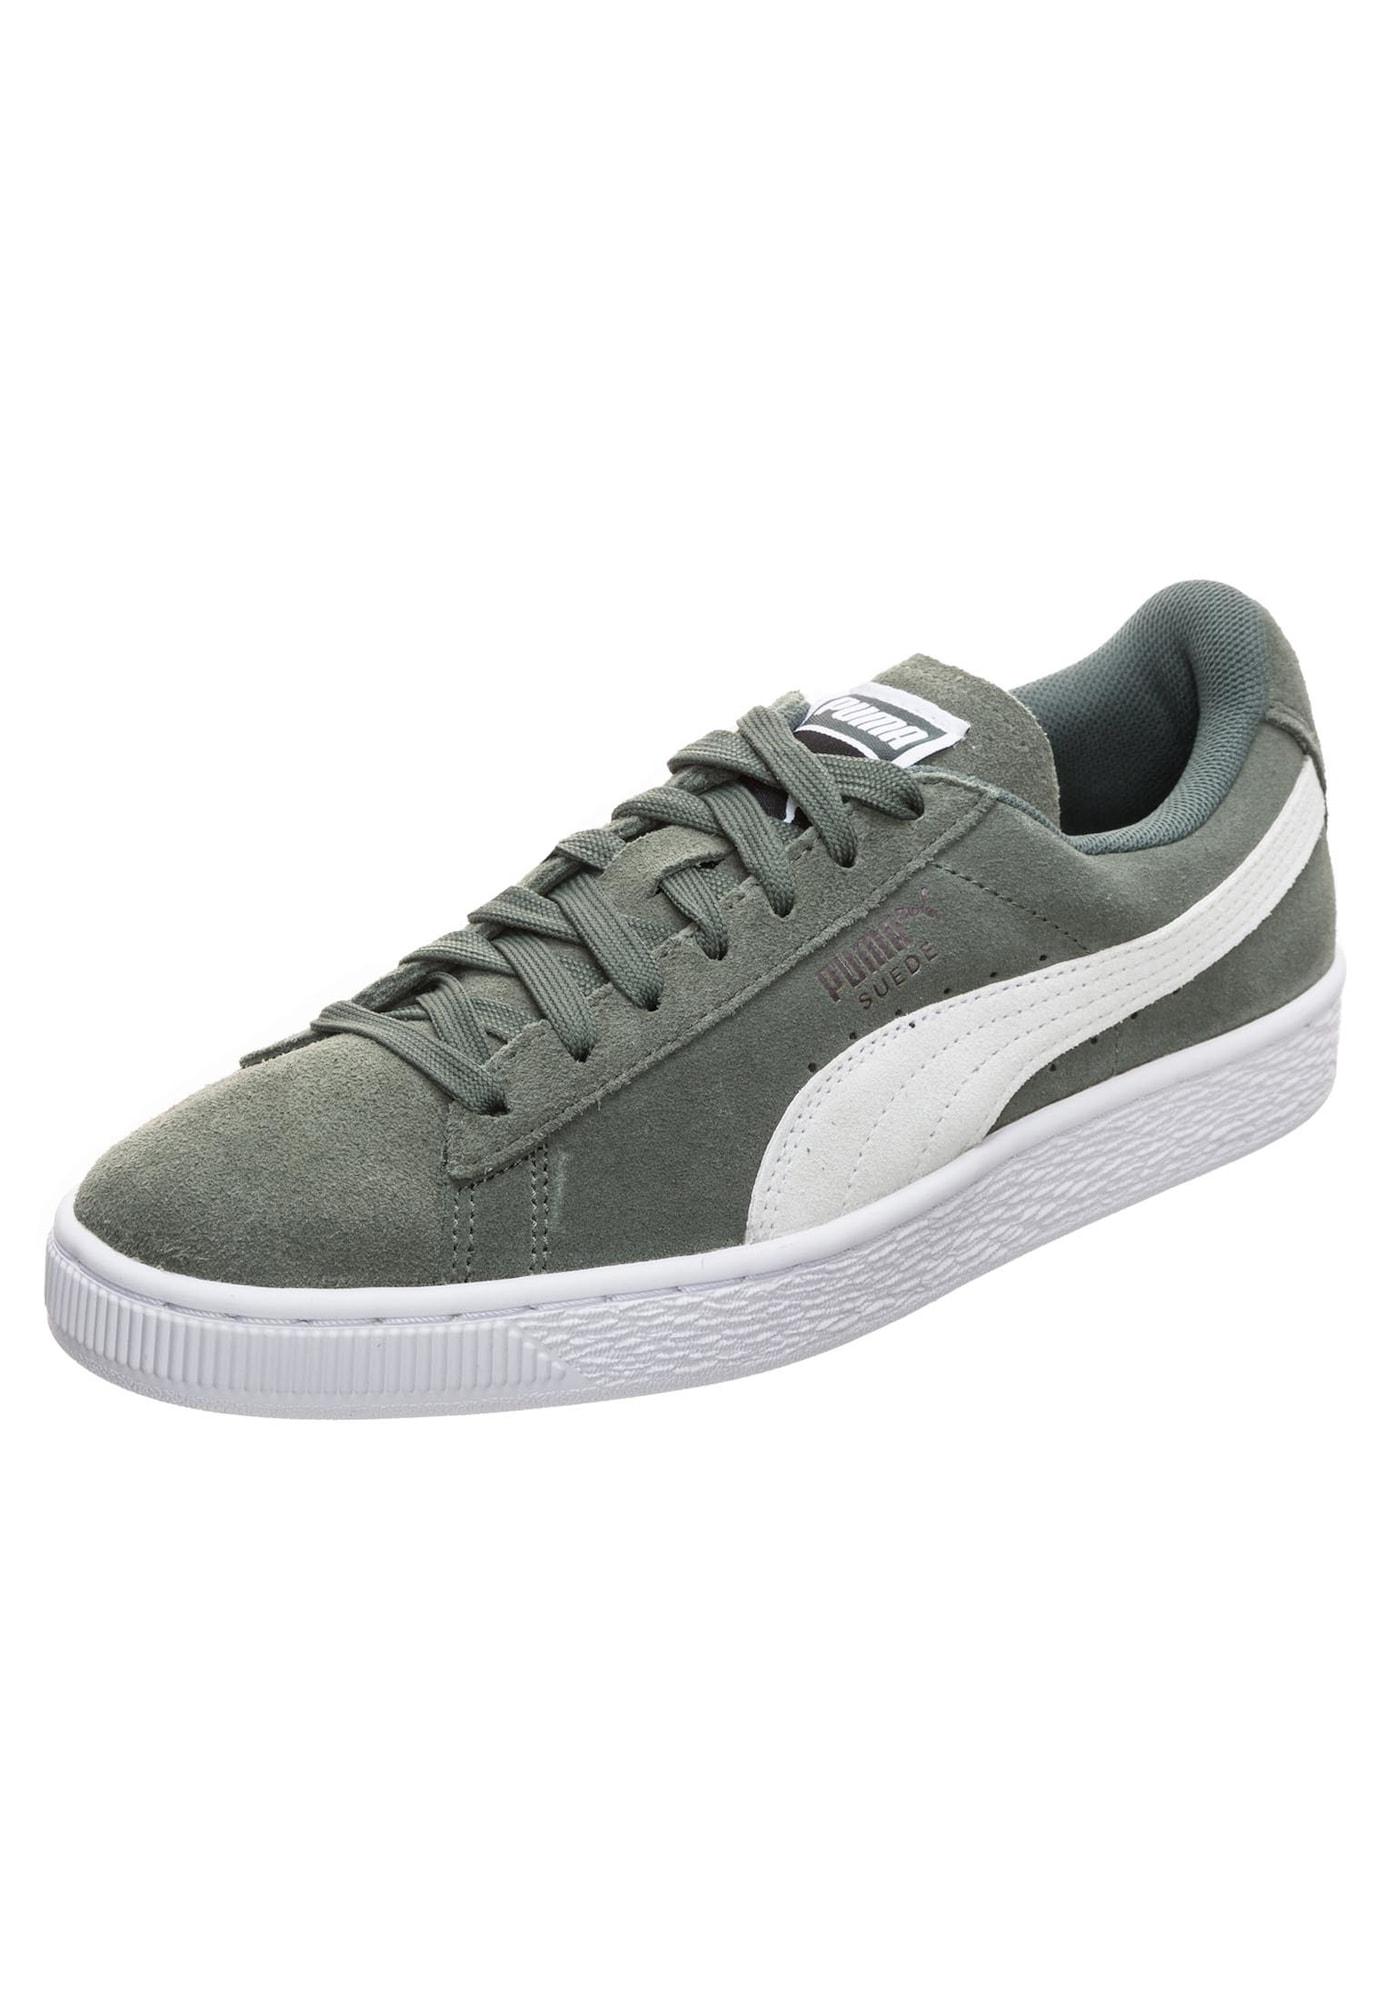 PUMA, Dames Sneakers laag 'Suede Classic', kaki / wit / natuurwit